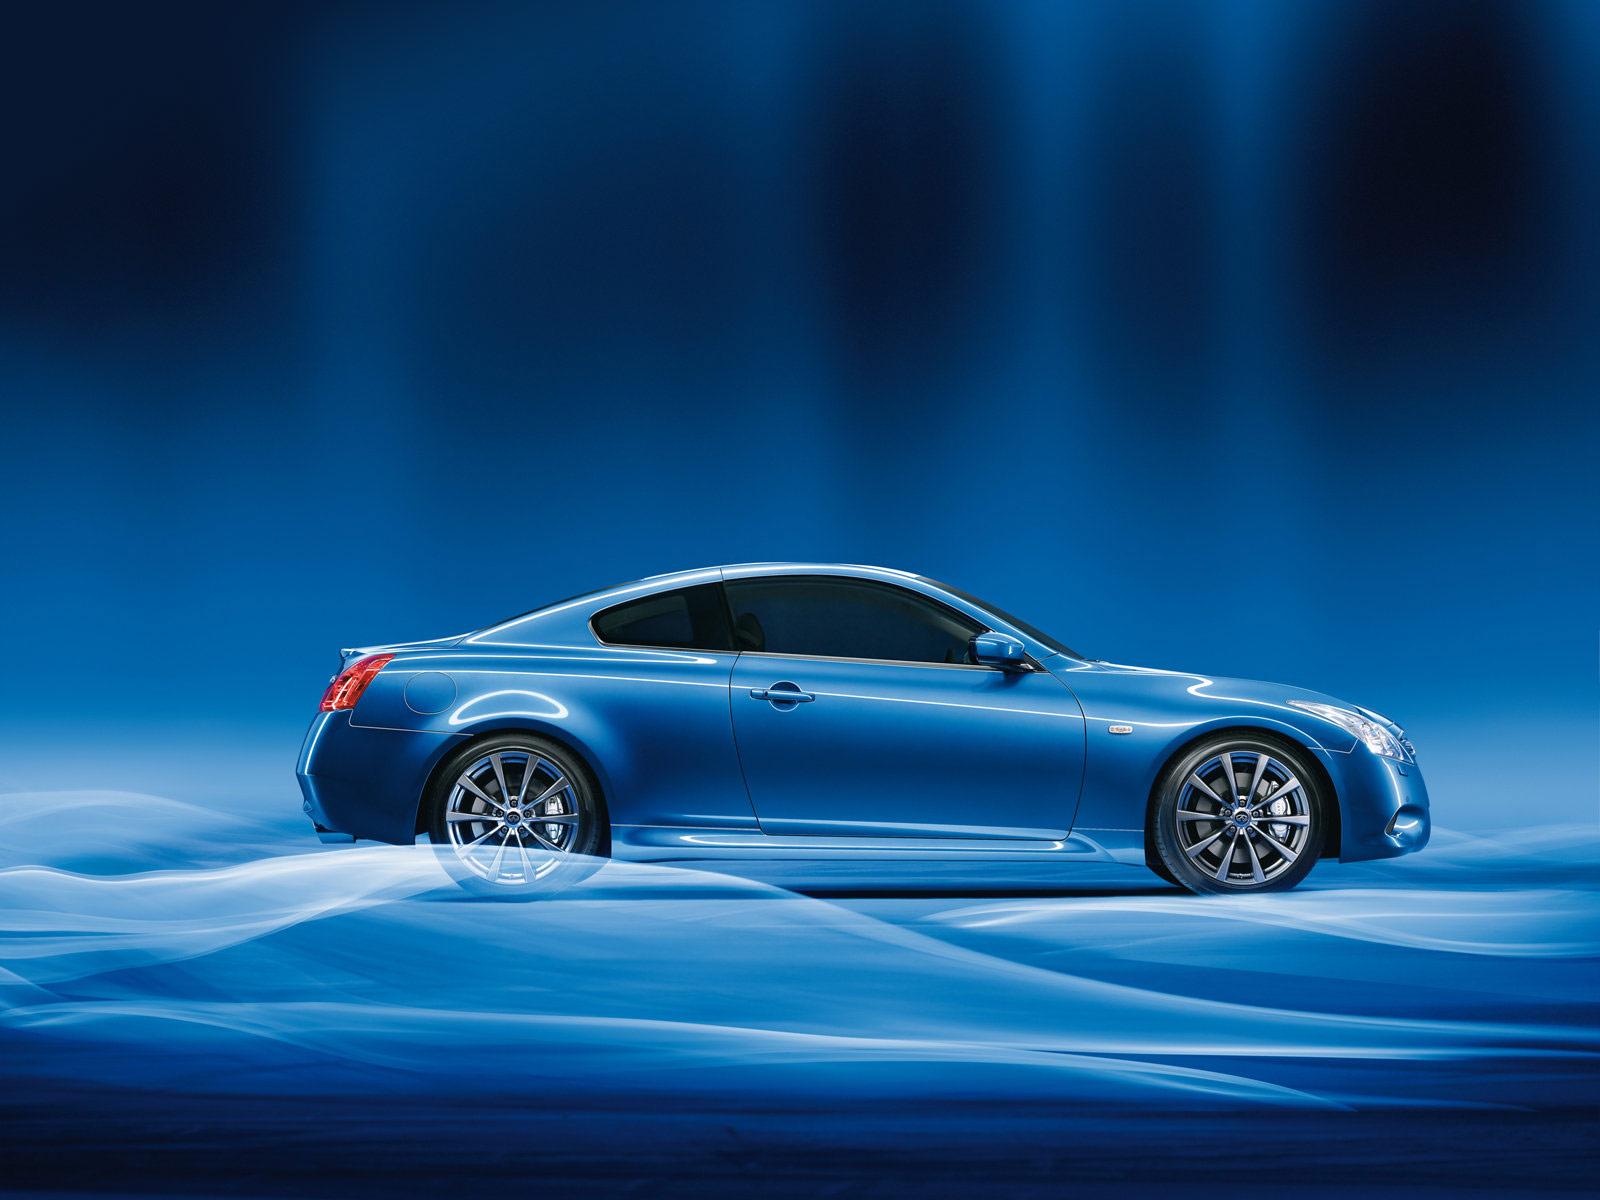 2008 Infiniti G37 Coupe Car Insurance Information Wallpaper Fuse Box